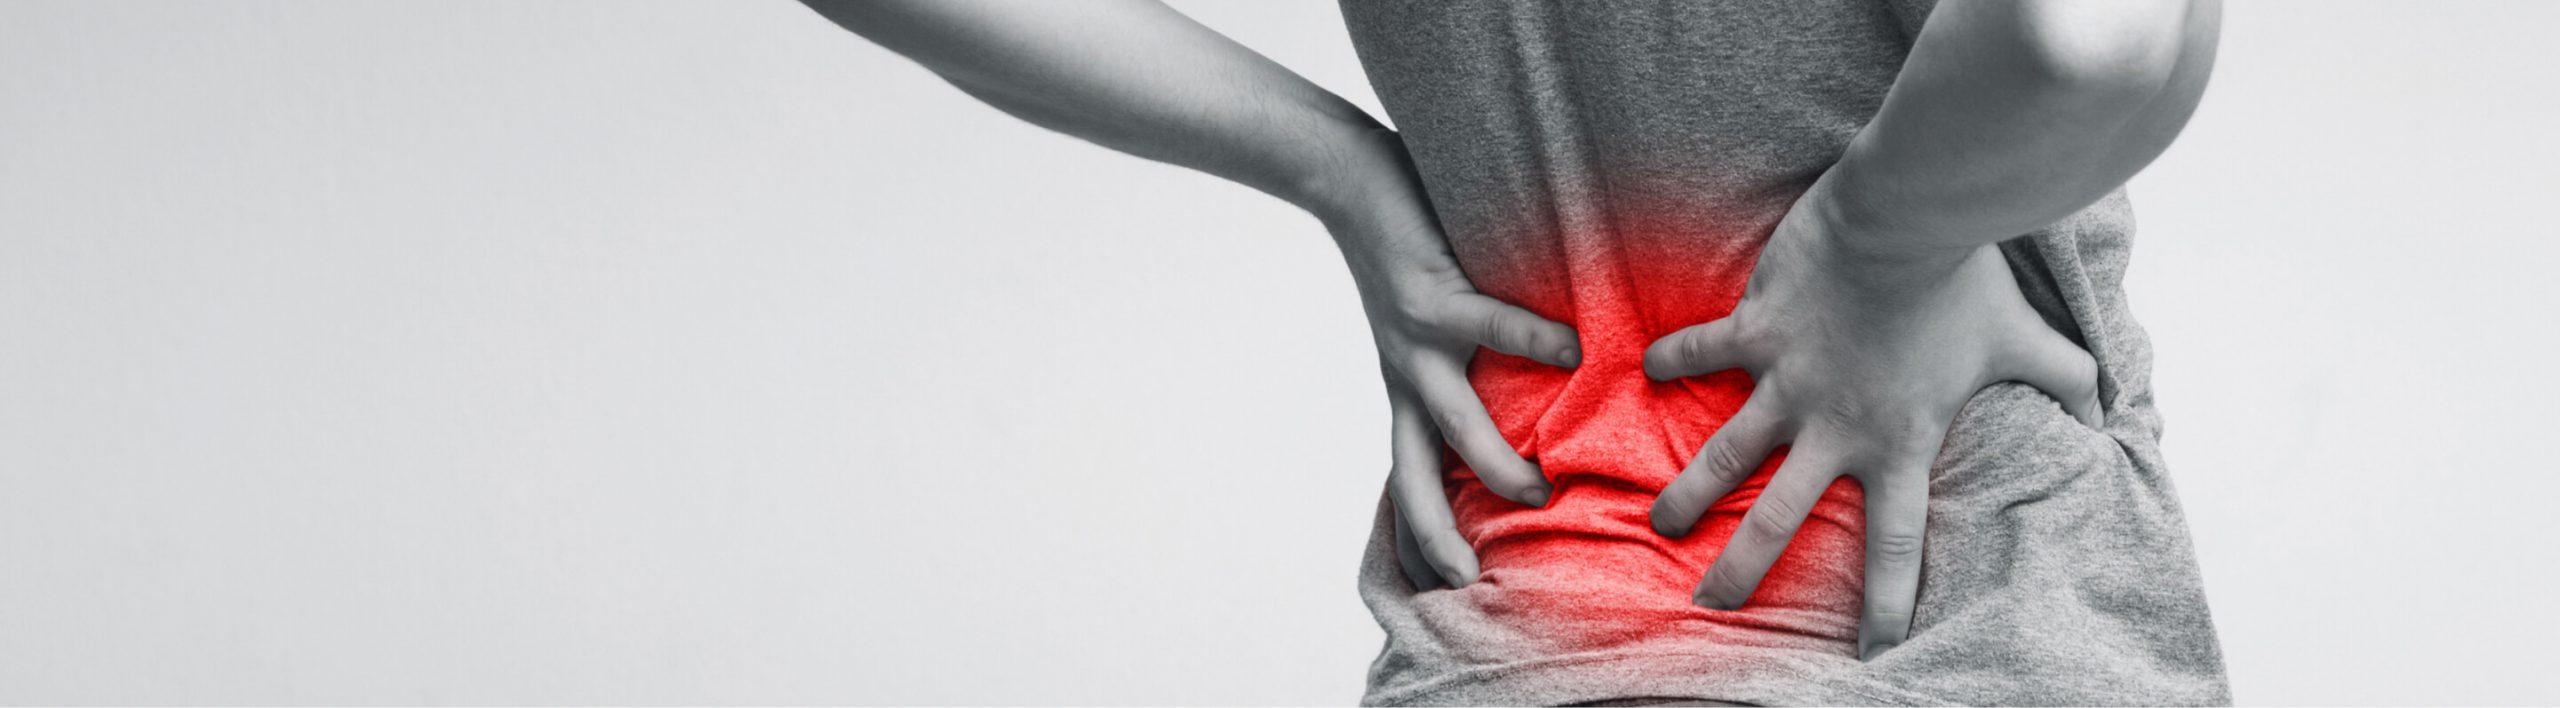 lower back pain north houston